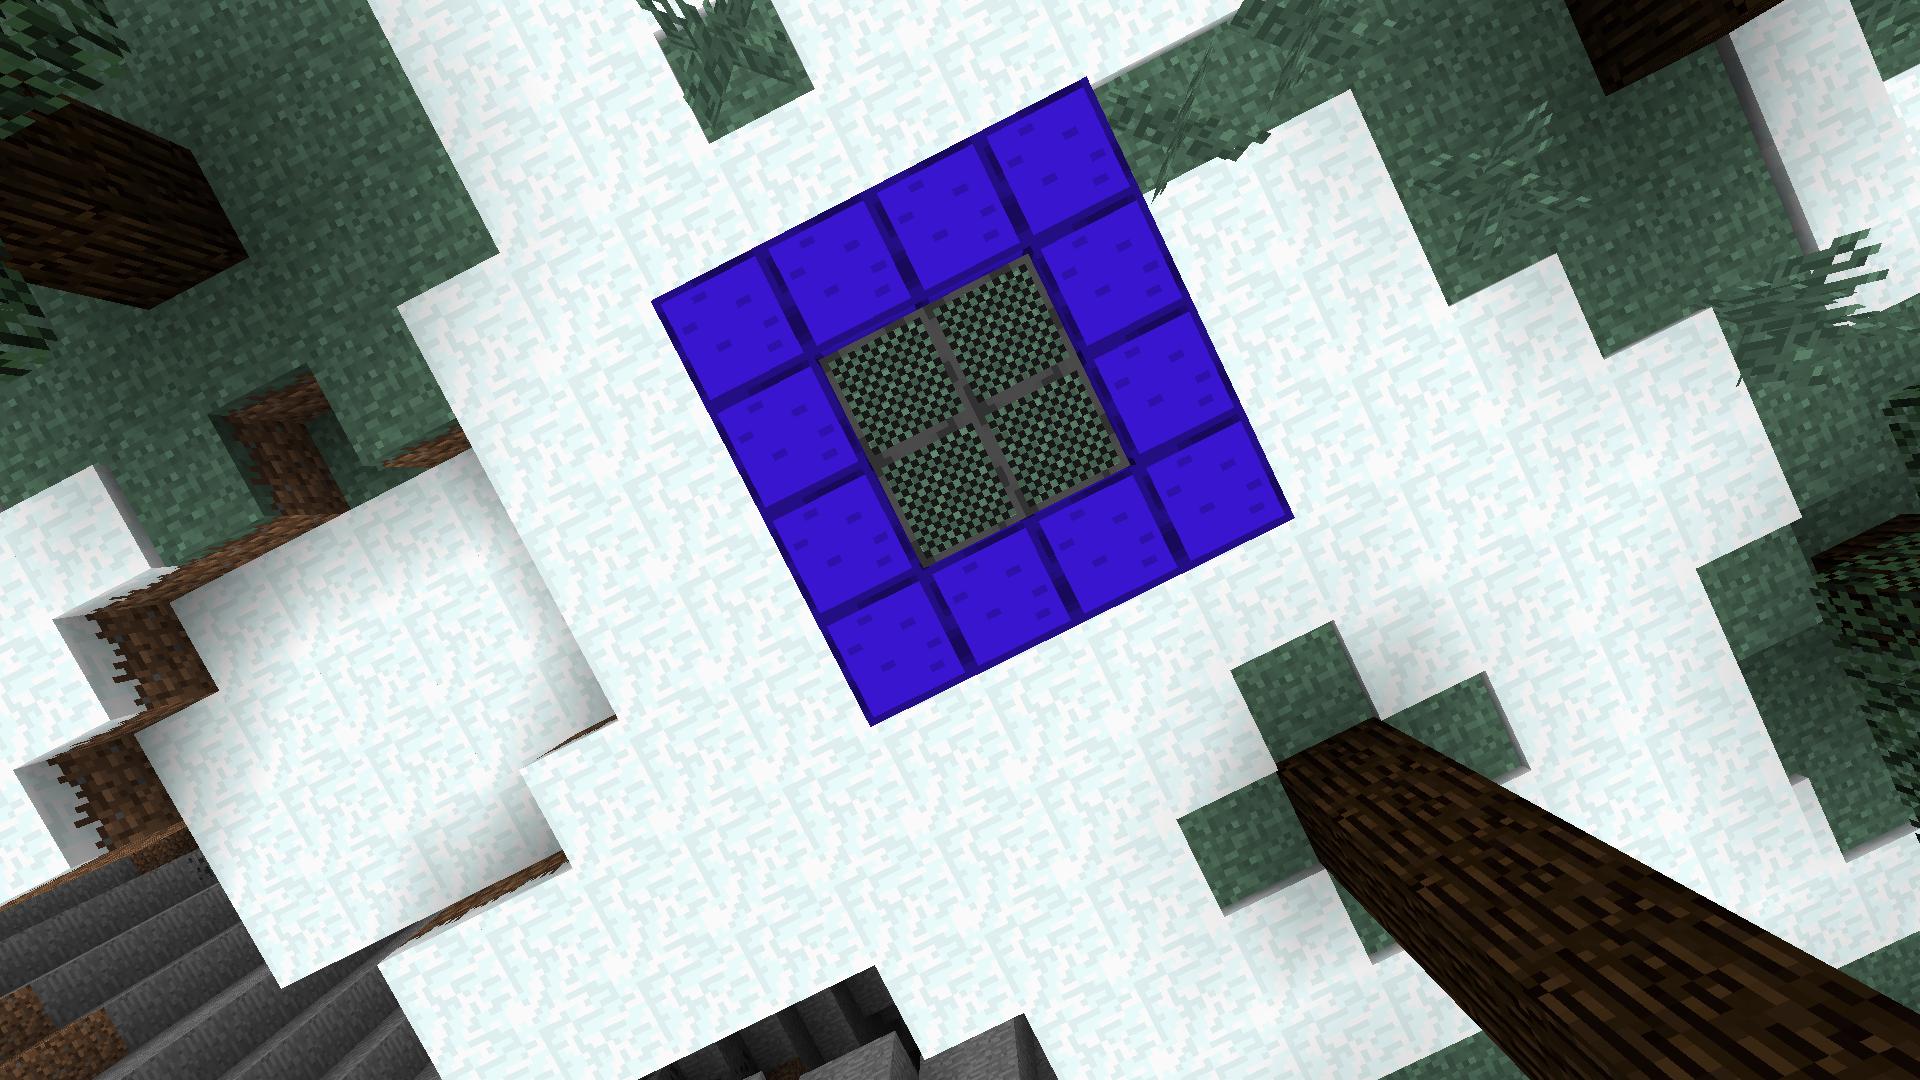 http://minecraft-forum.net/wp-content/uploads/2013/01/3cfb3__Trampoline-Mod-3.png